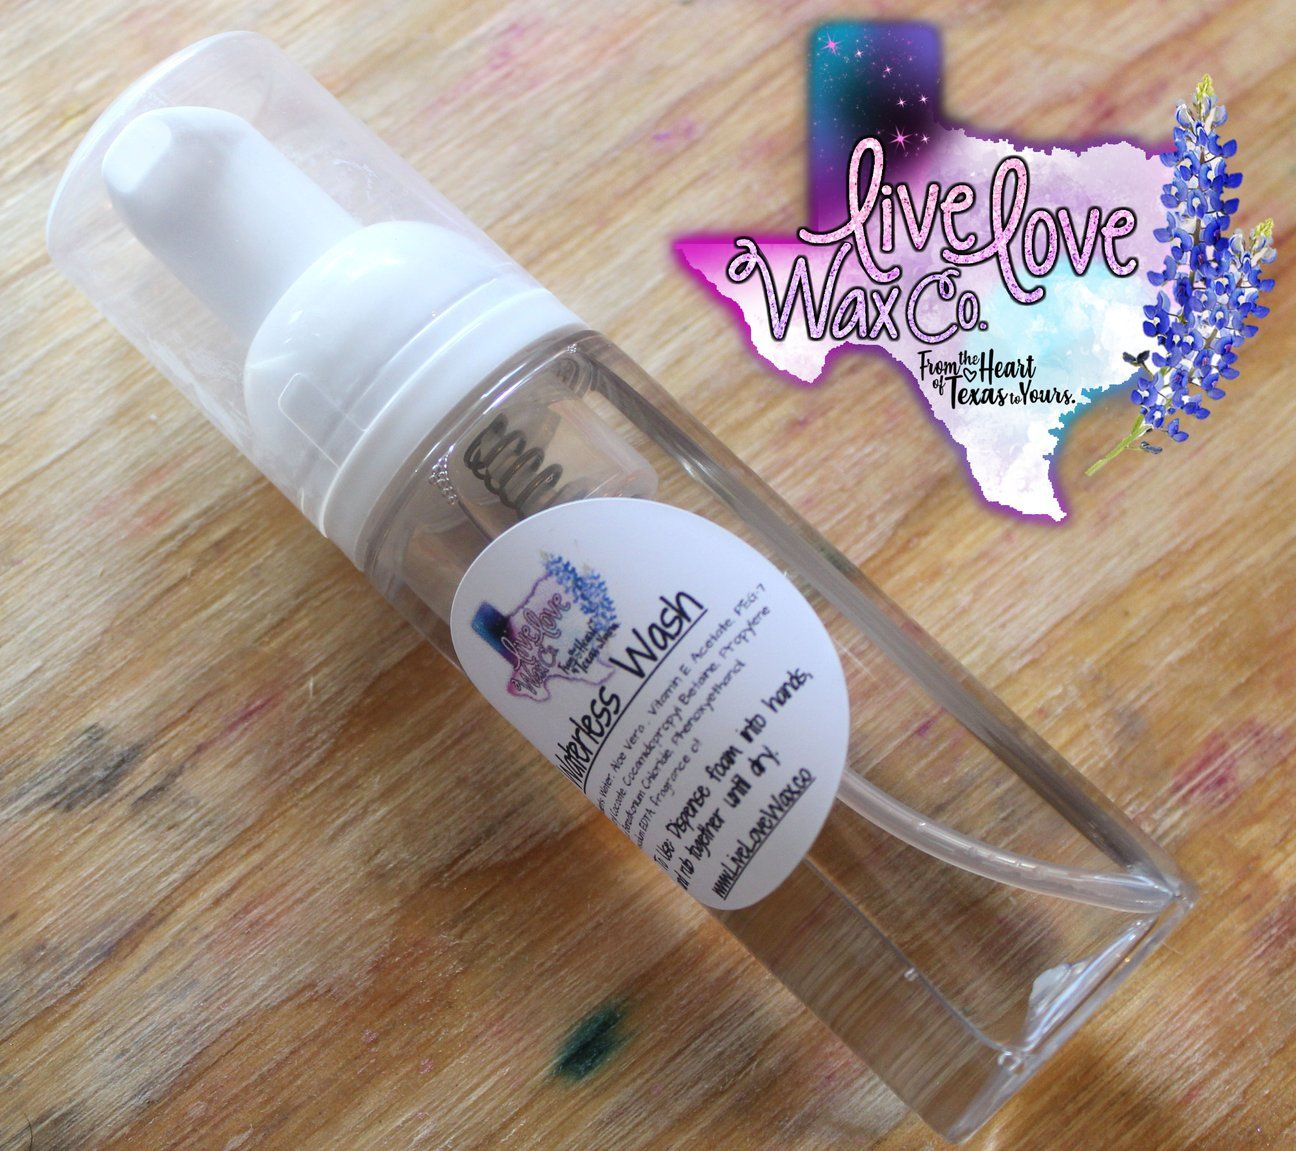 Foaming Waterless Hand Wash Preorder Hand Washing Wax Melts